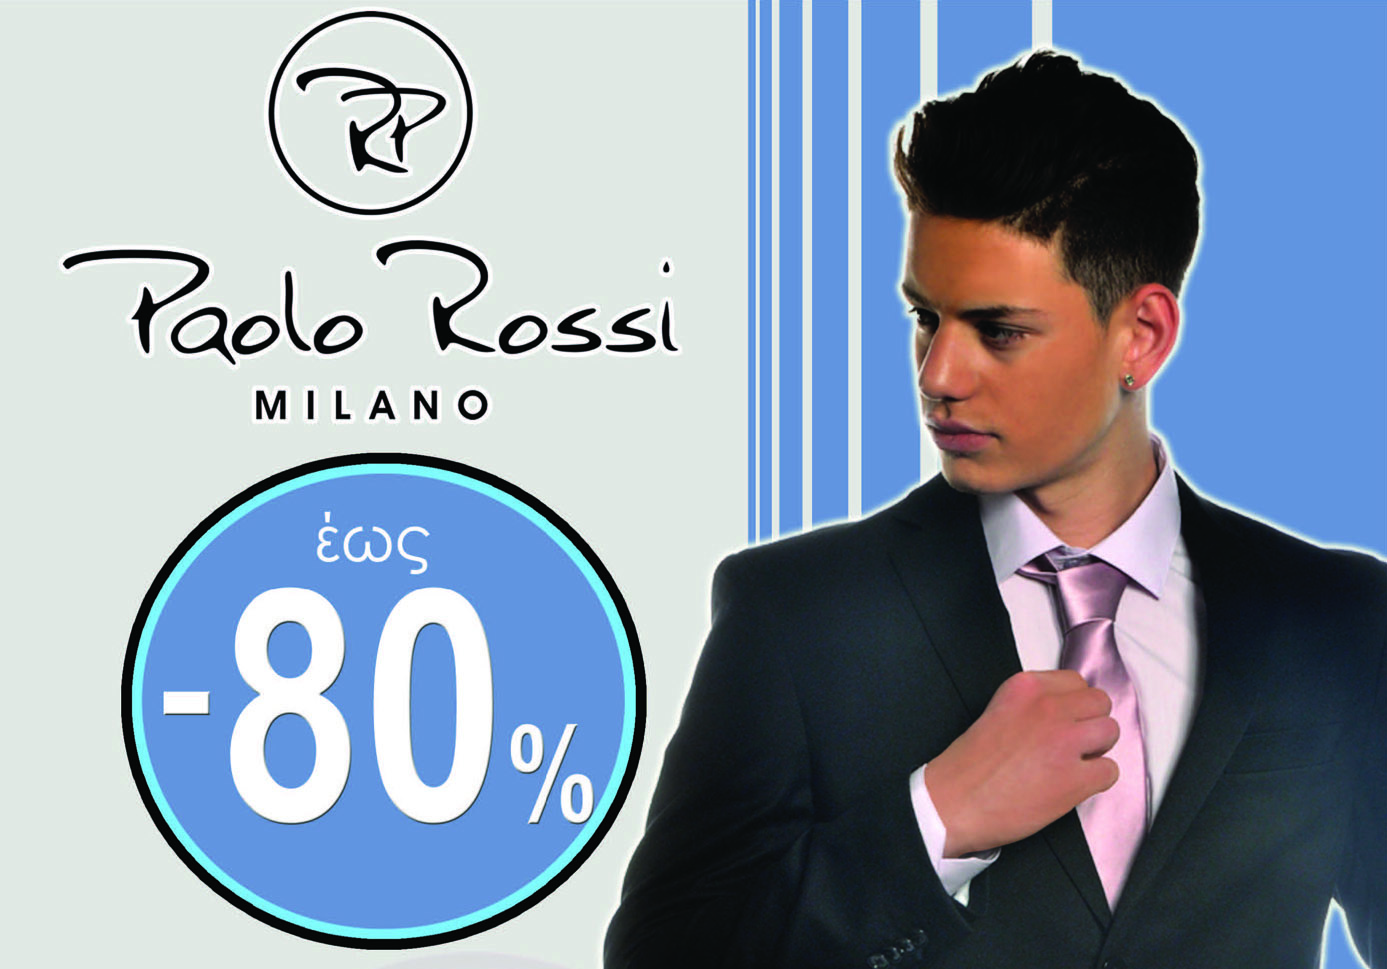 Paolo Rossi: Καλοκαιρινές προσφορές έως -80%